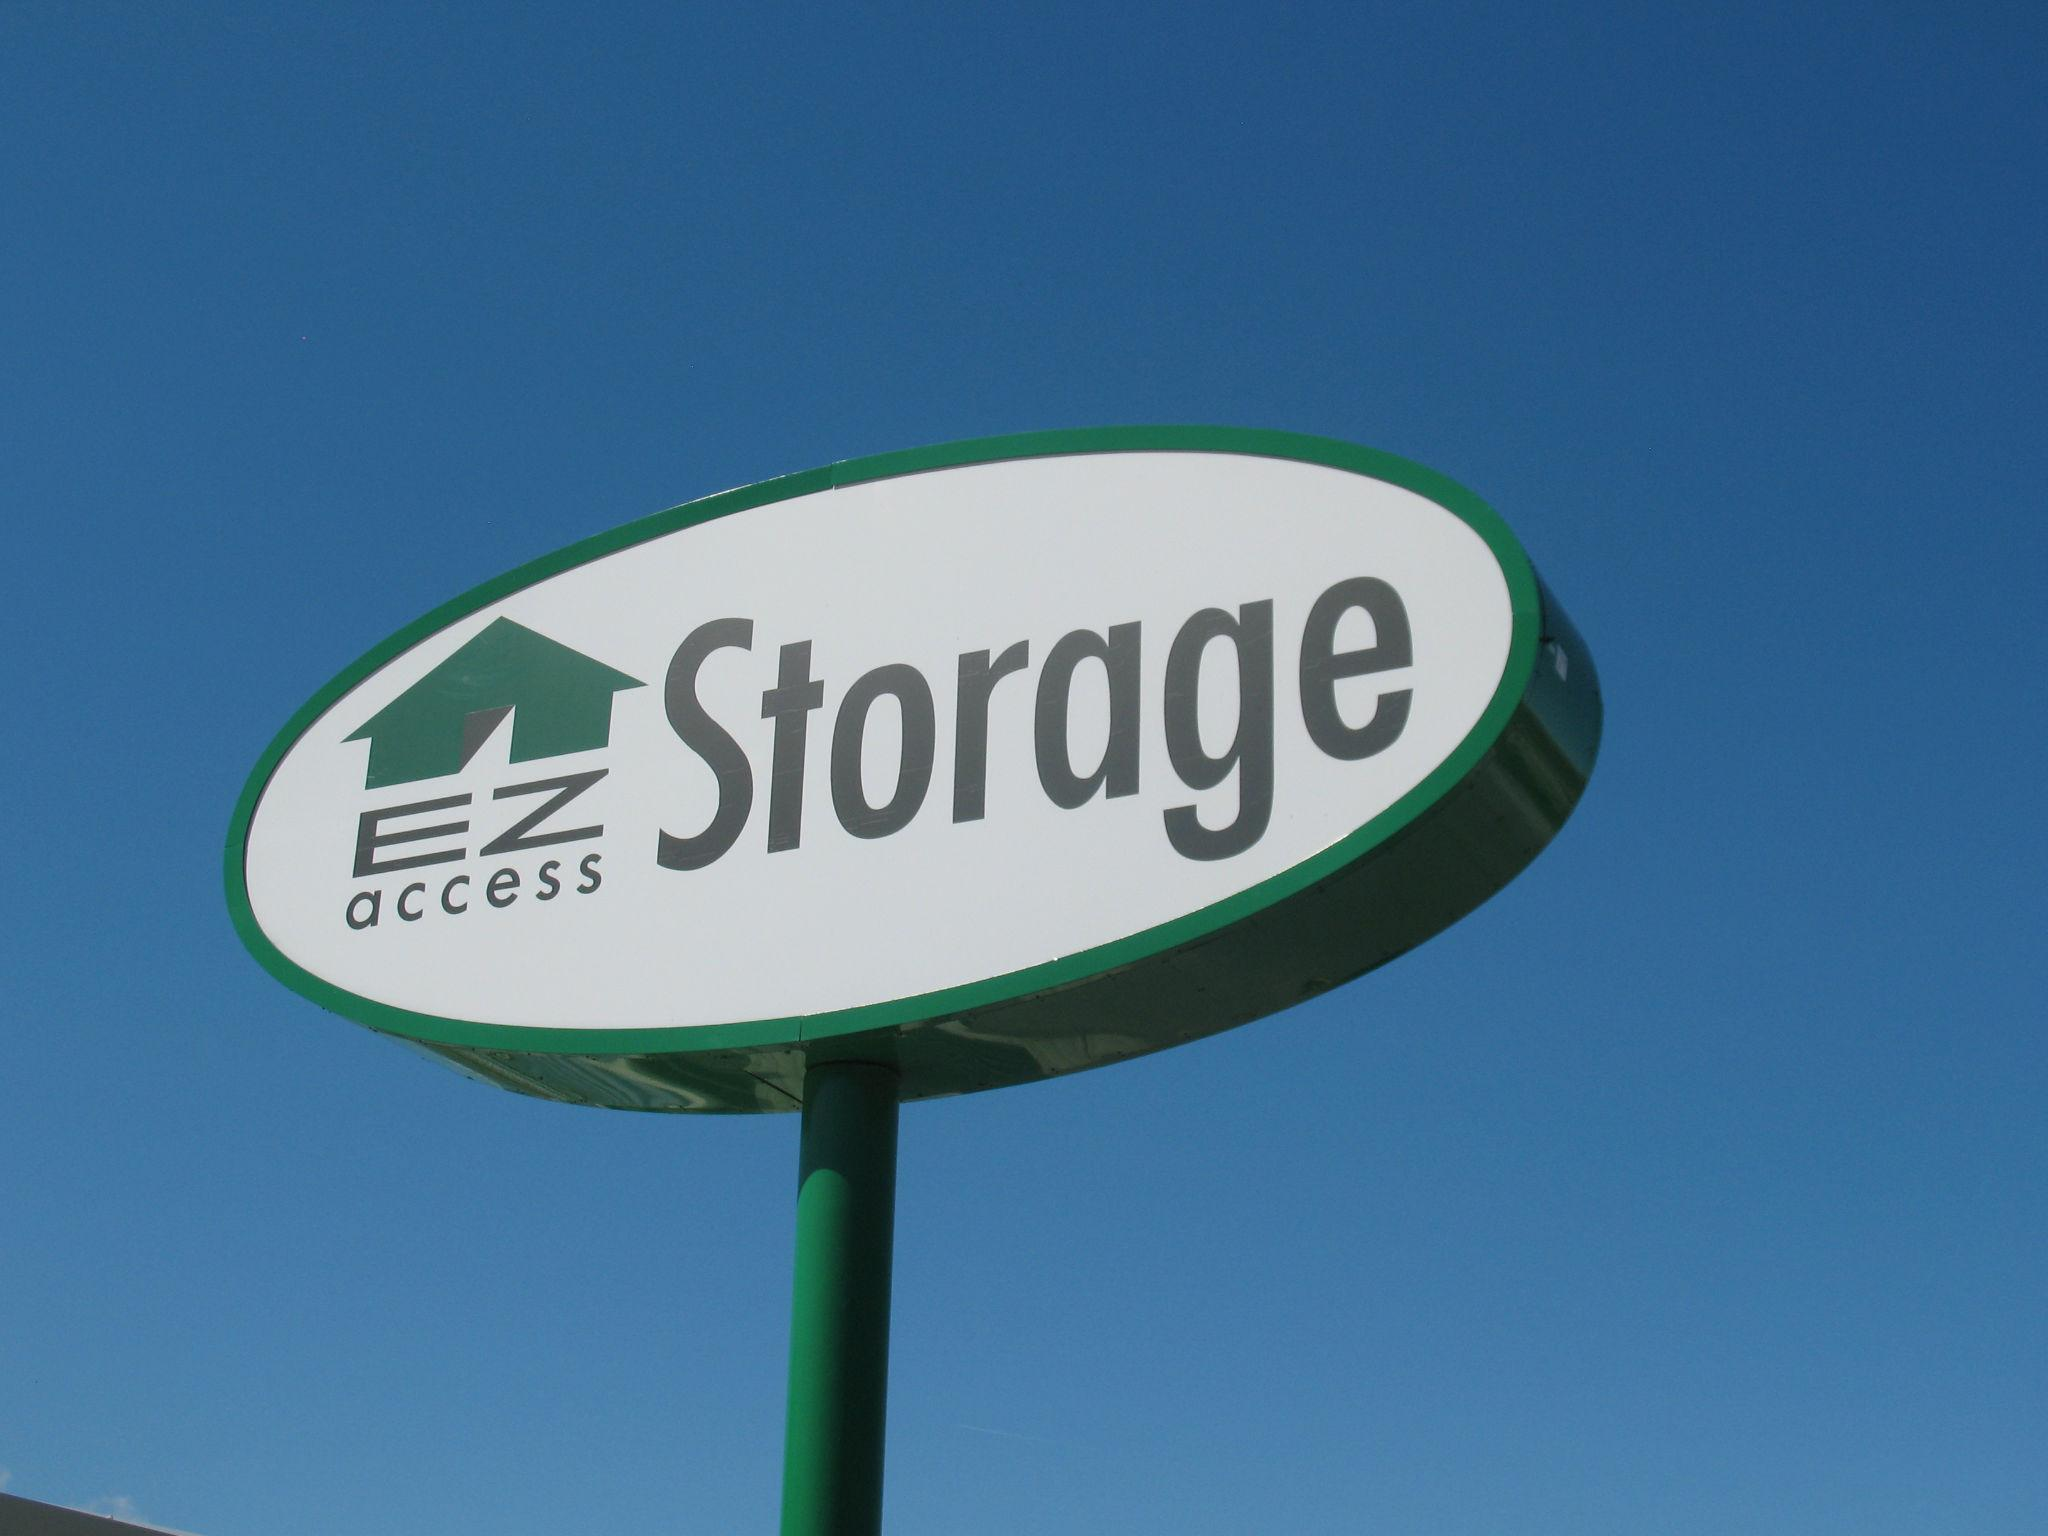 Ez access storage in east wenatchee wa 98802 chamberofcommerce com